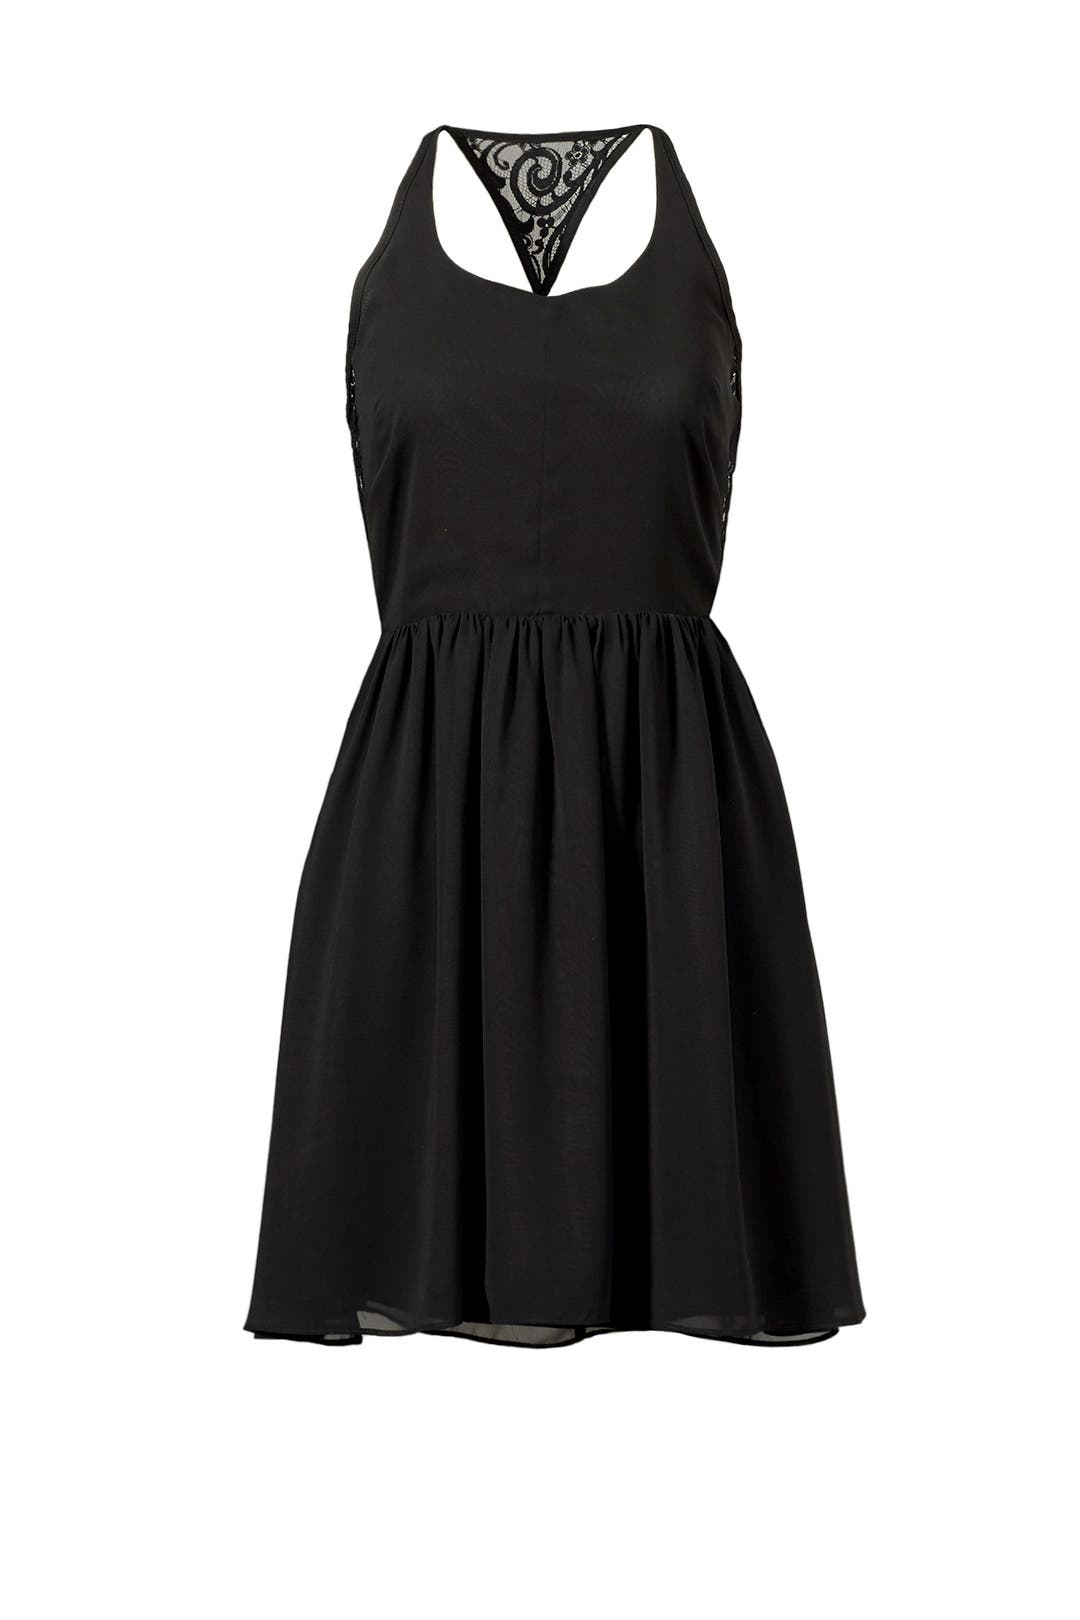 Chanty Dress by Slate & Willow